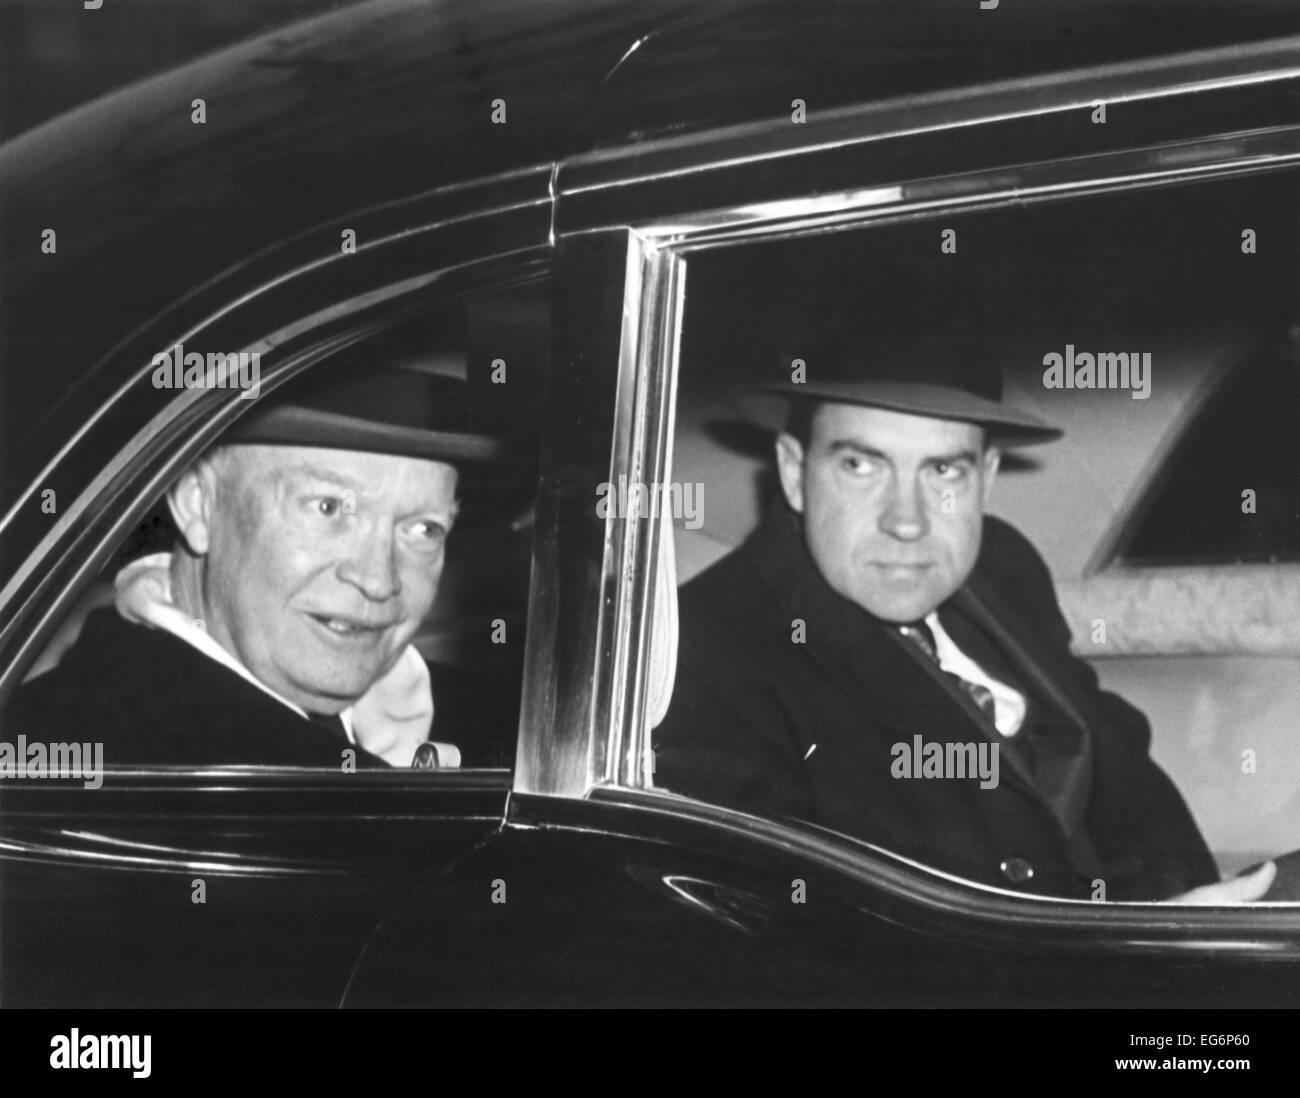 Who Was Richard Nixon Vice President: President Eisenhower And Vice President Richard Nixon In A